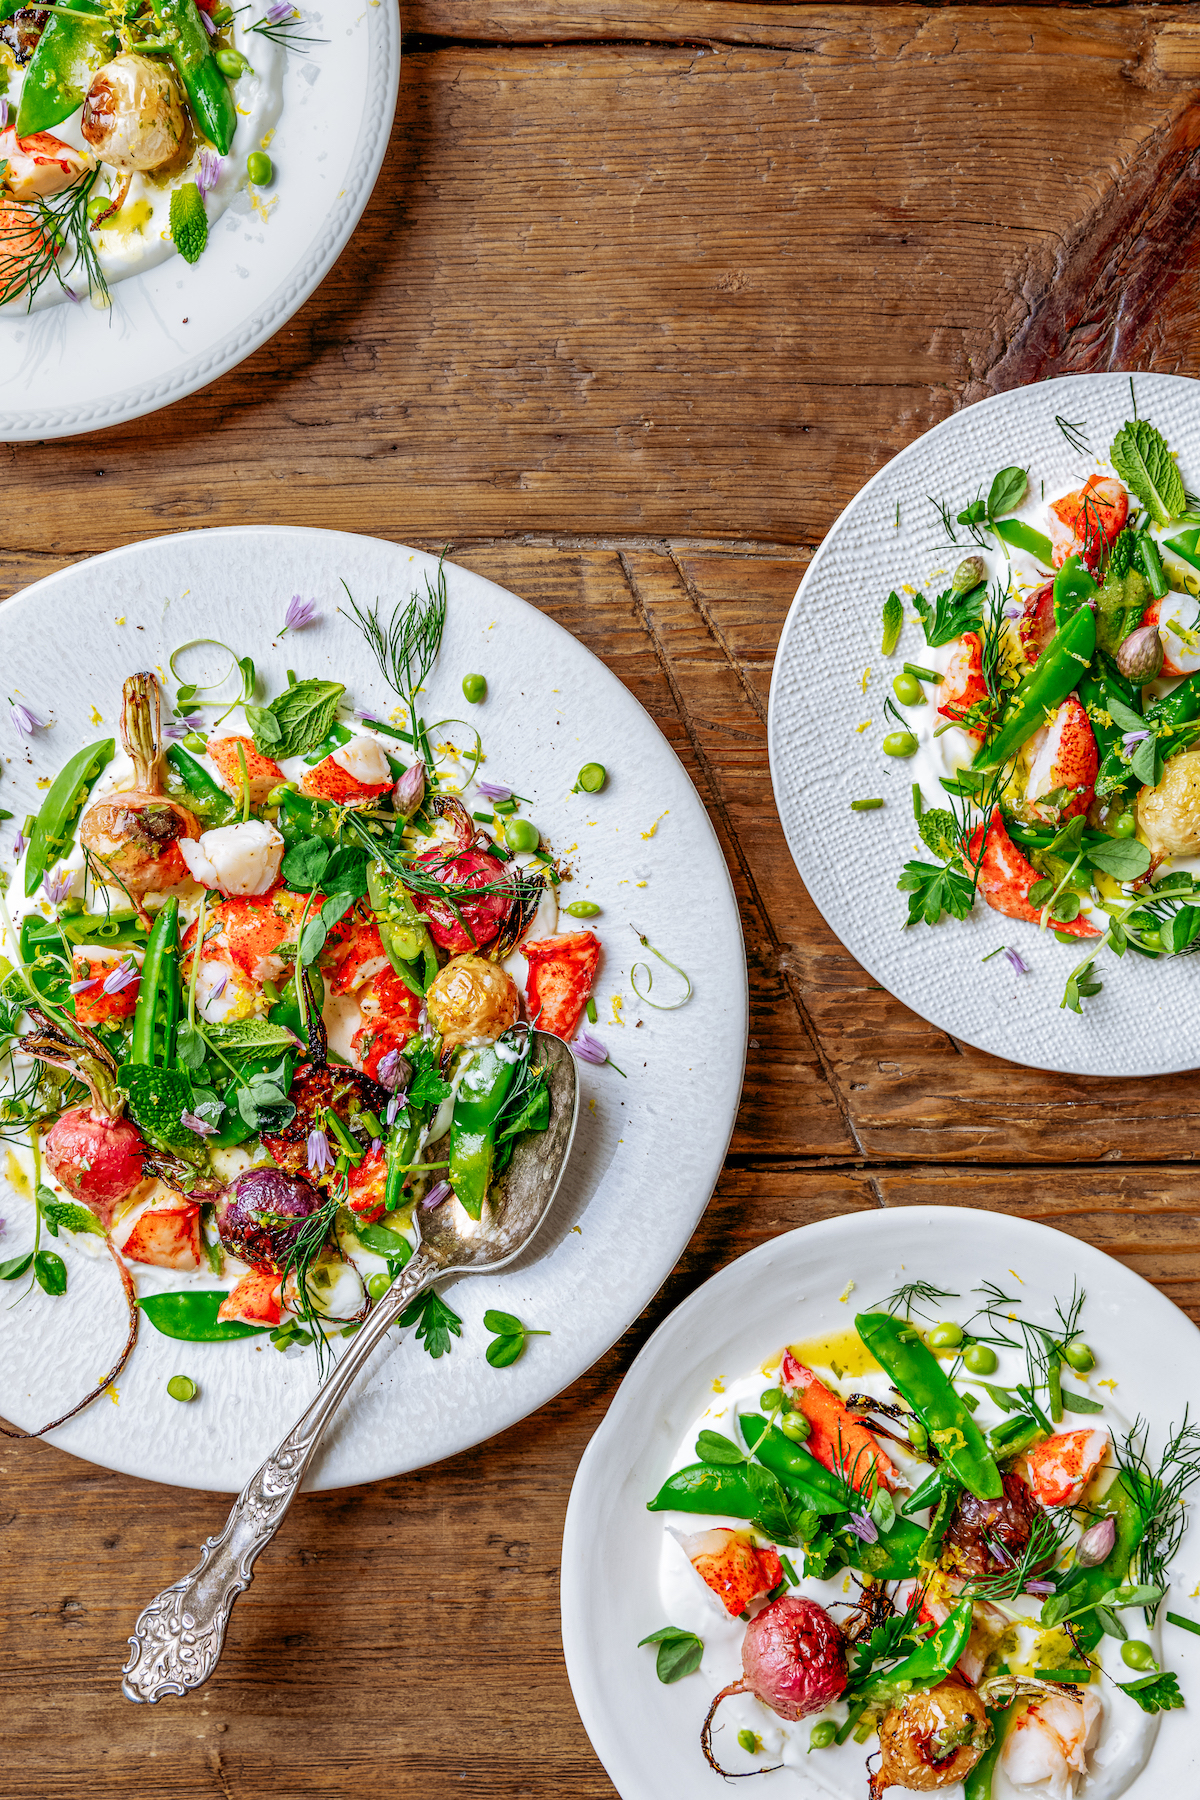 Maine Lobster Salad with Spring Peas, Radish and Tarragon Vinaigrette